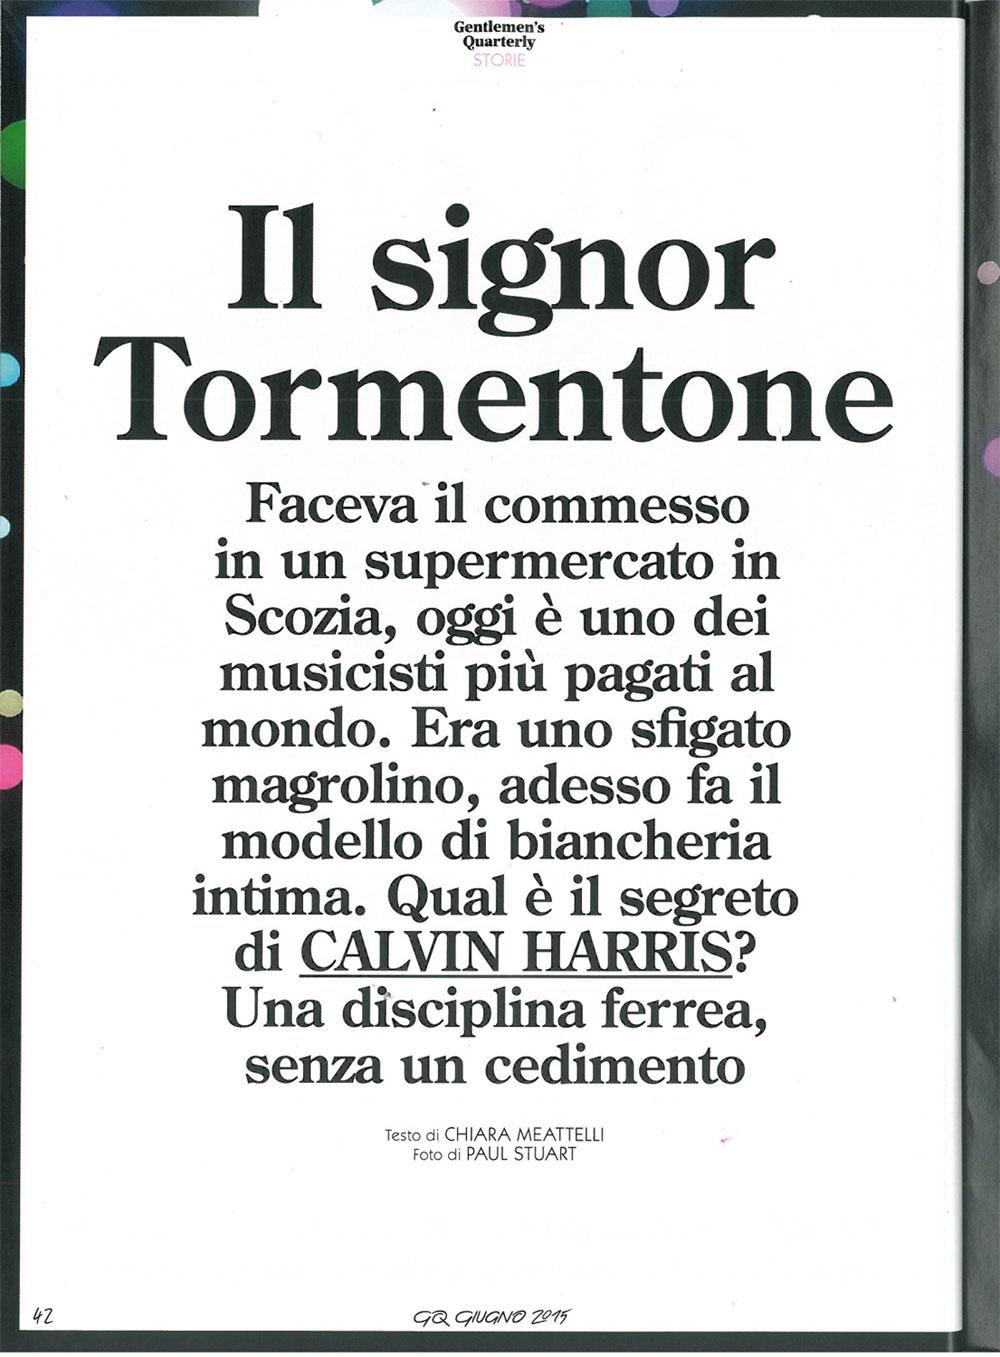 GQ: Calvin Harris interview